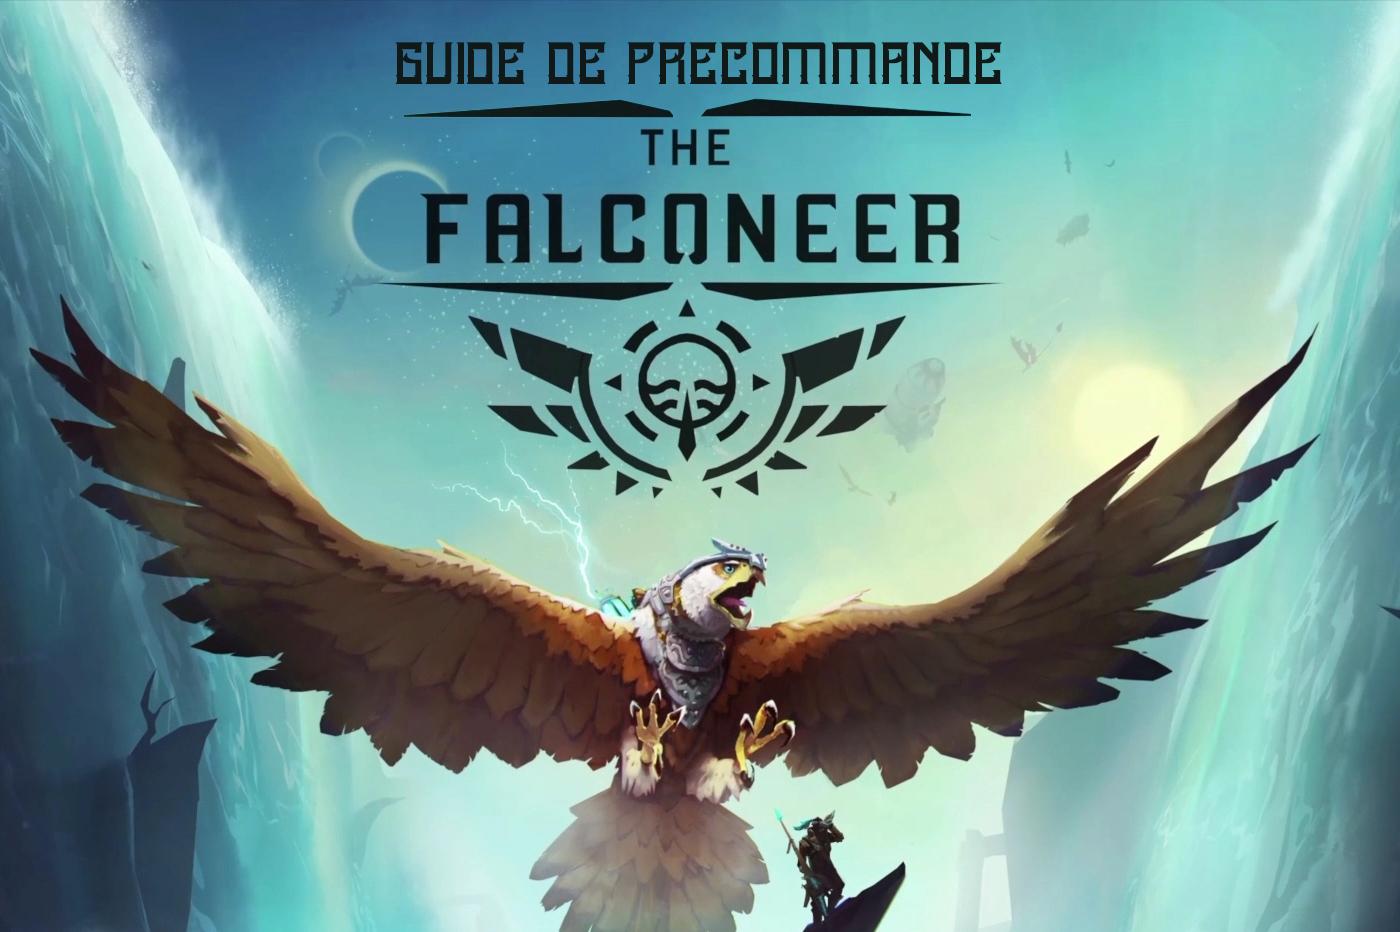 Guide Précommande The Falconeer